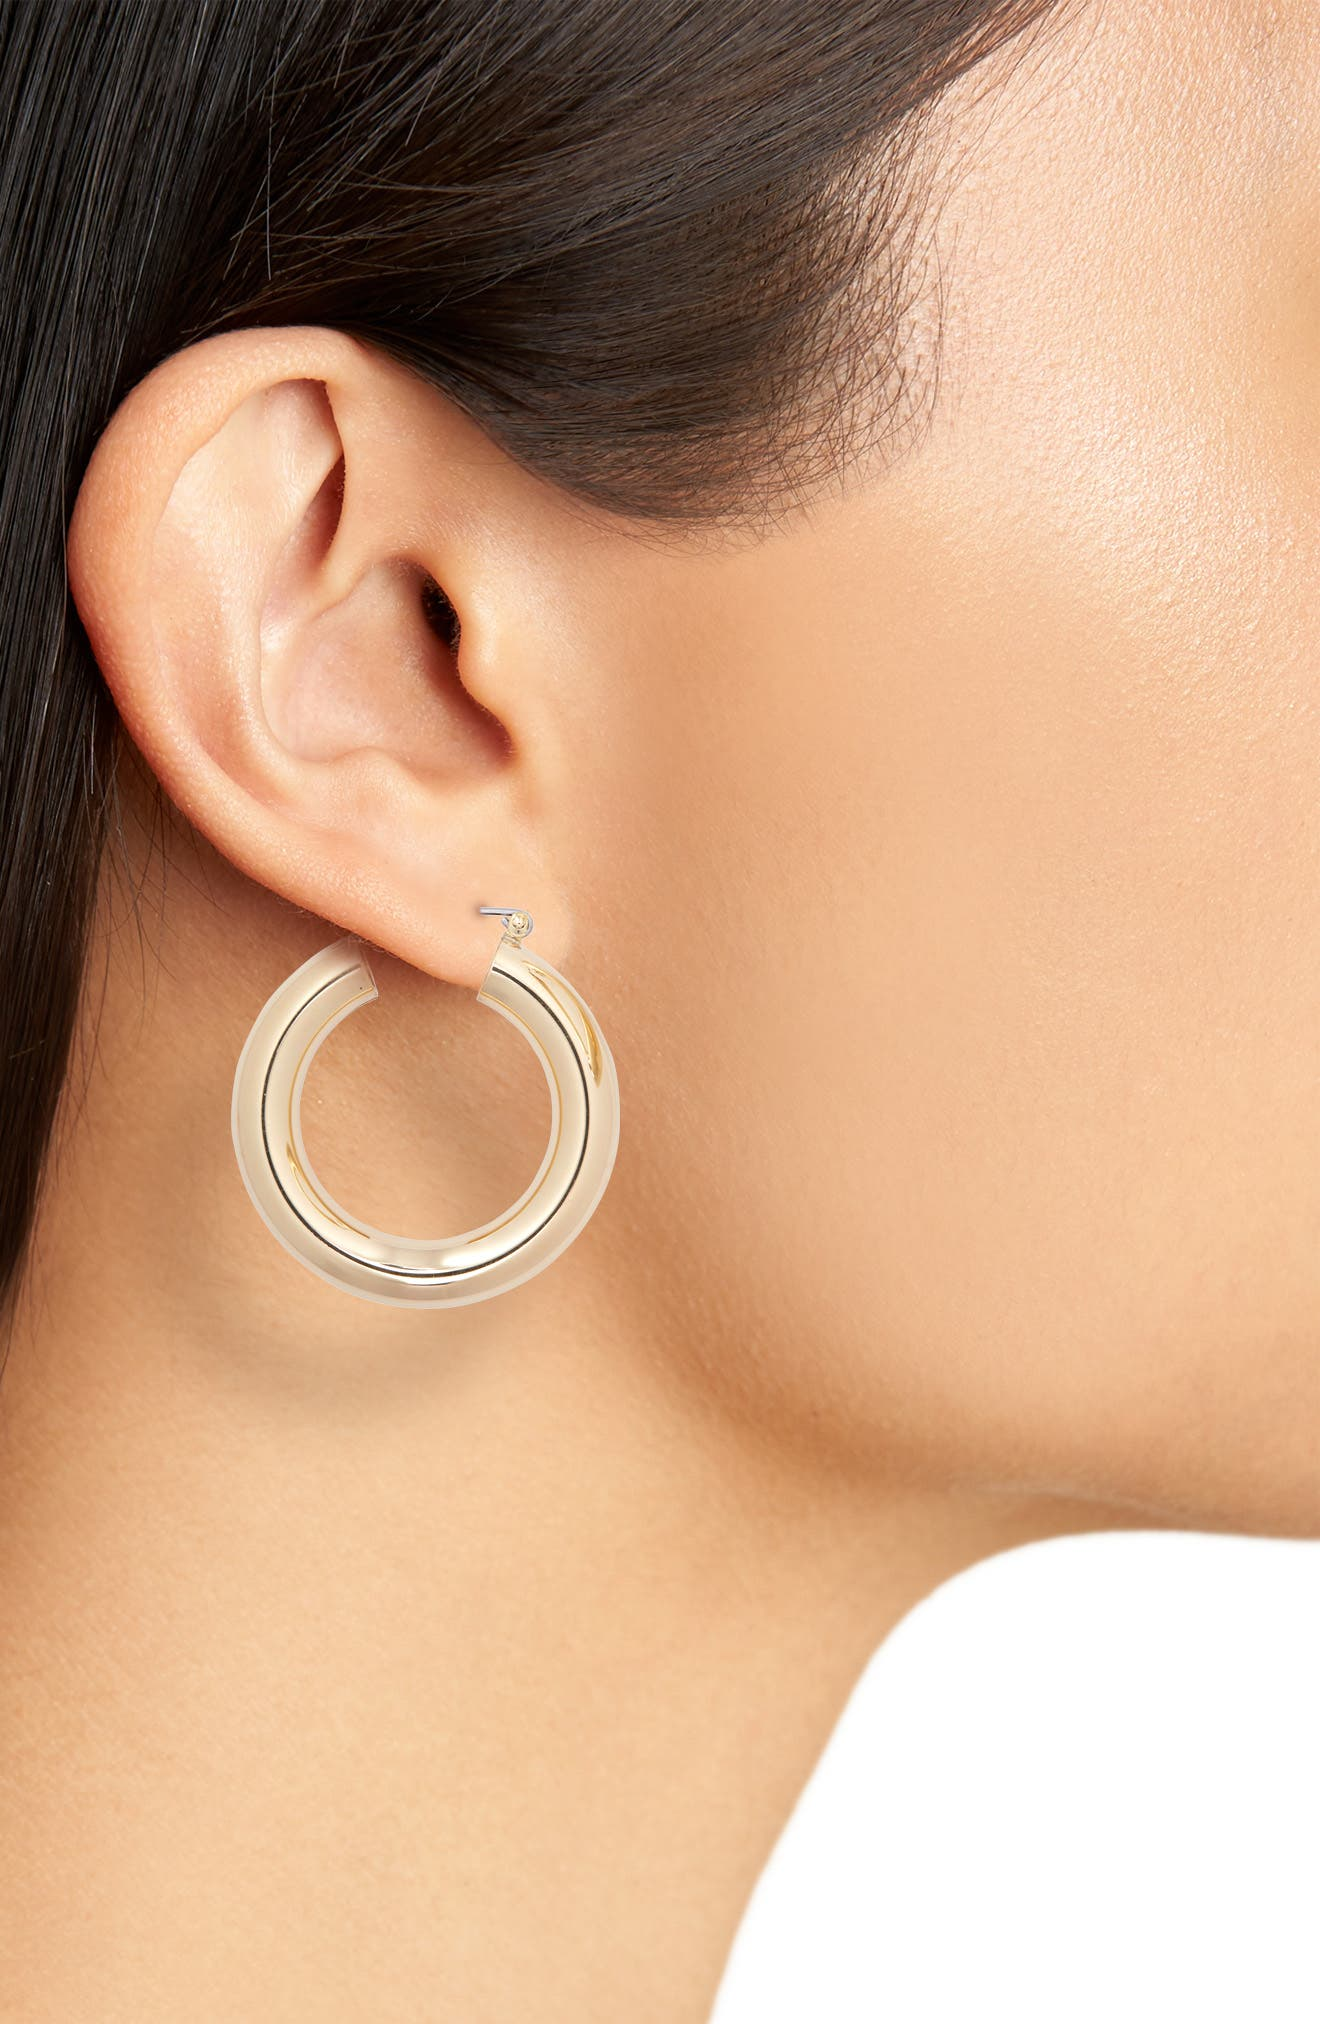 Round Hoop Earrings,                             Alternate thumbnail 2, color,                             BRASS